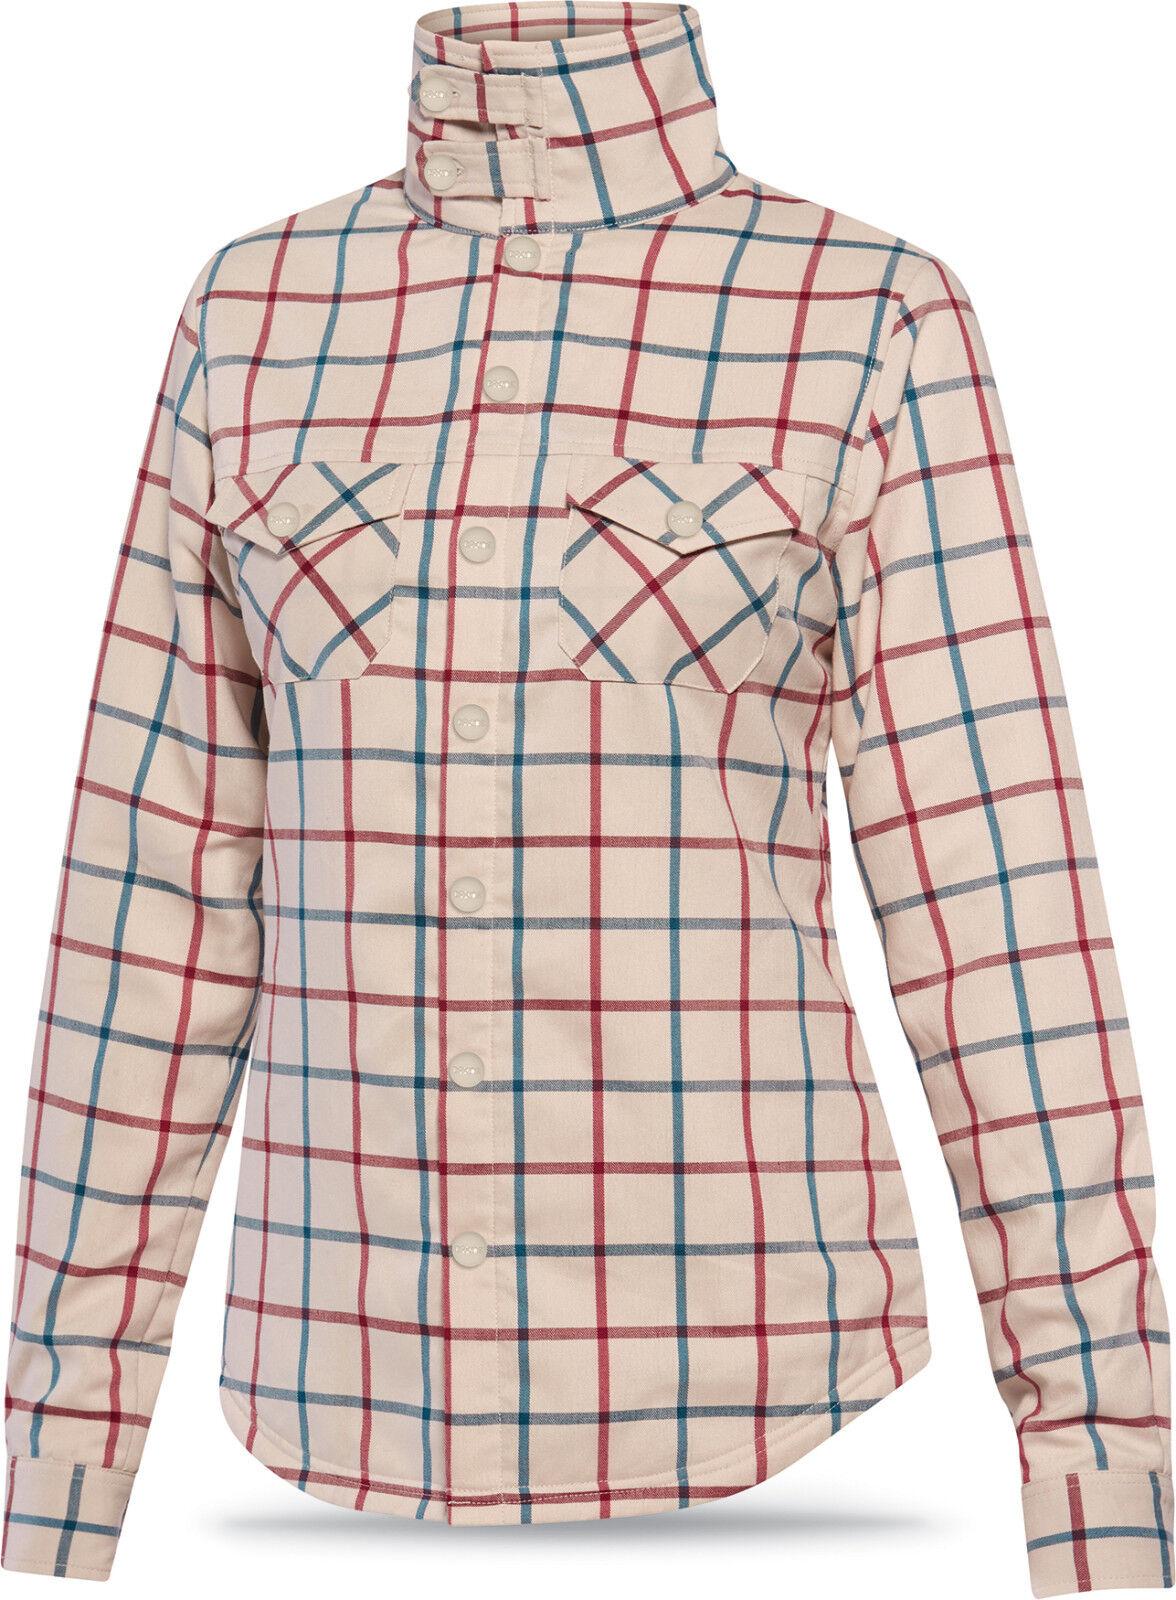 Dakine CAMERON Womens Flannel Mid Layer Top Turtledove Plaid Medium NEW